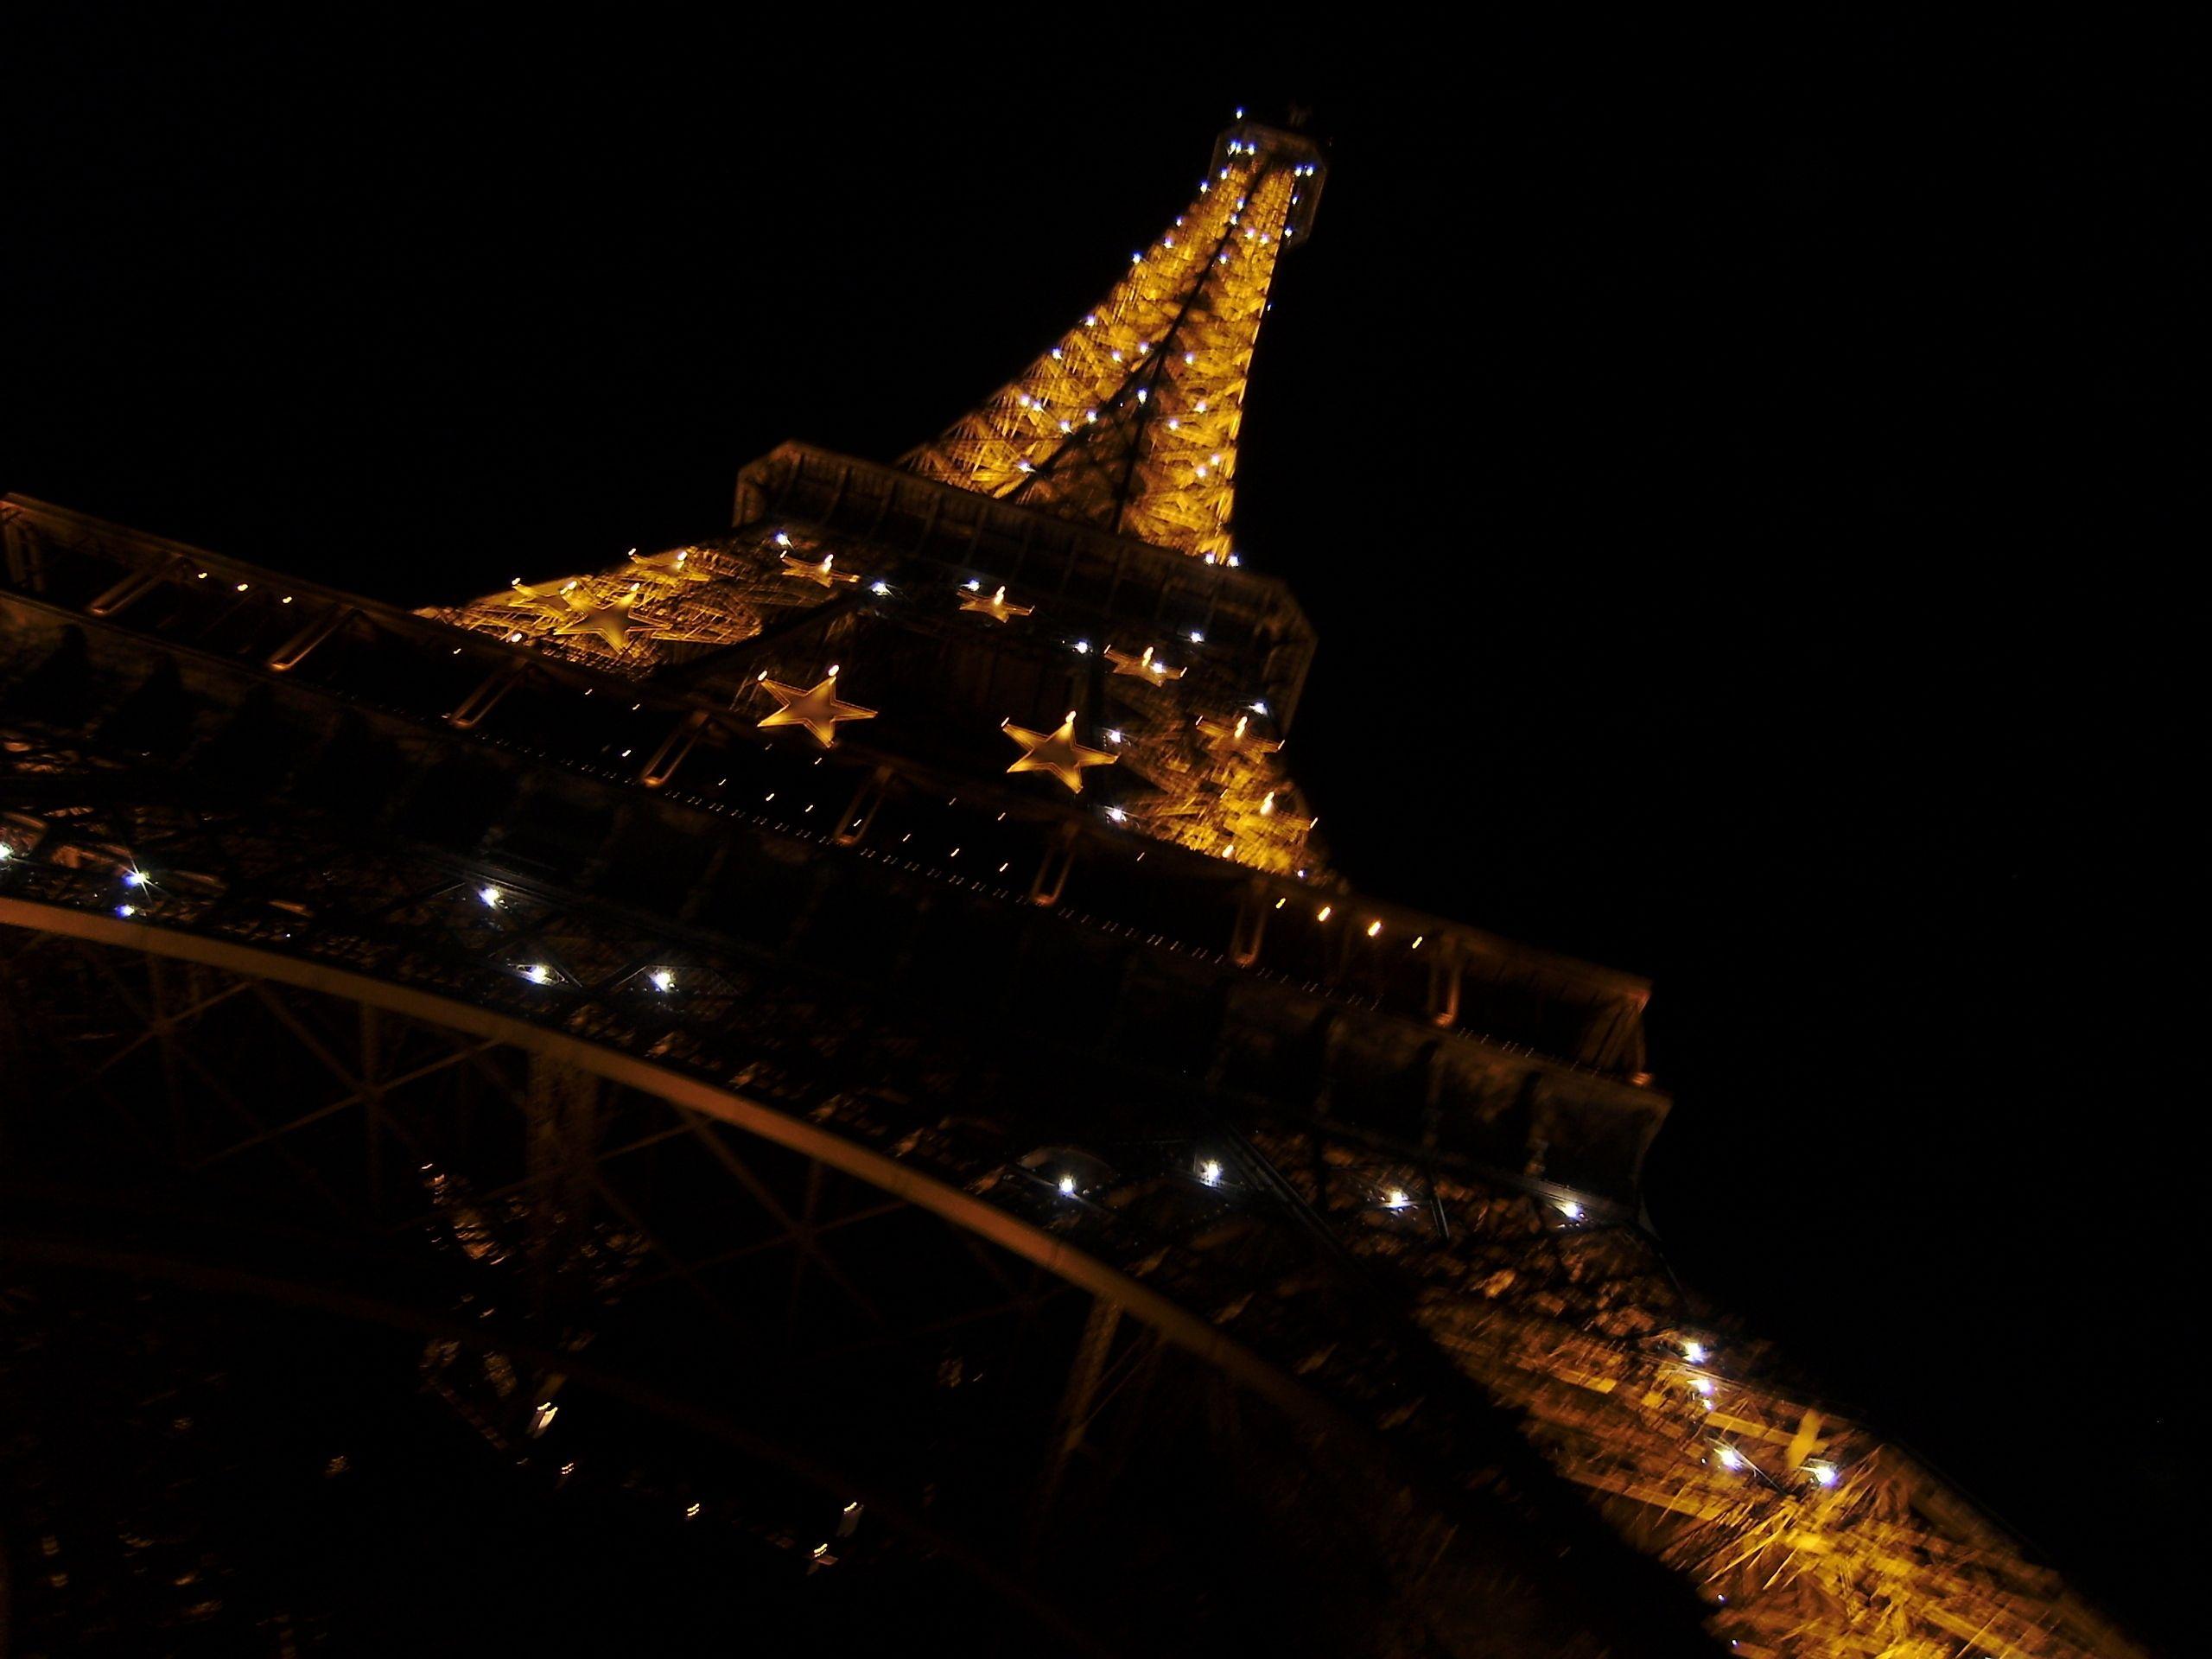 Eiffel Tower Paris Night In High Resolution Eiffel Tower Paris At Night Eiffel